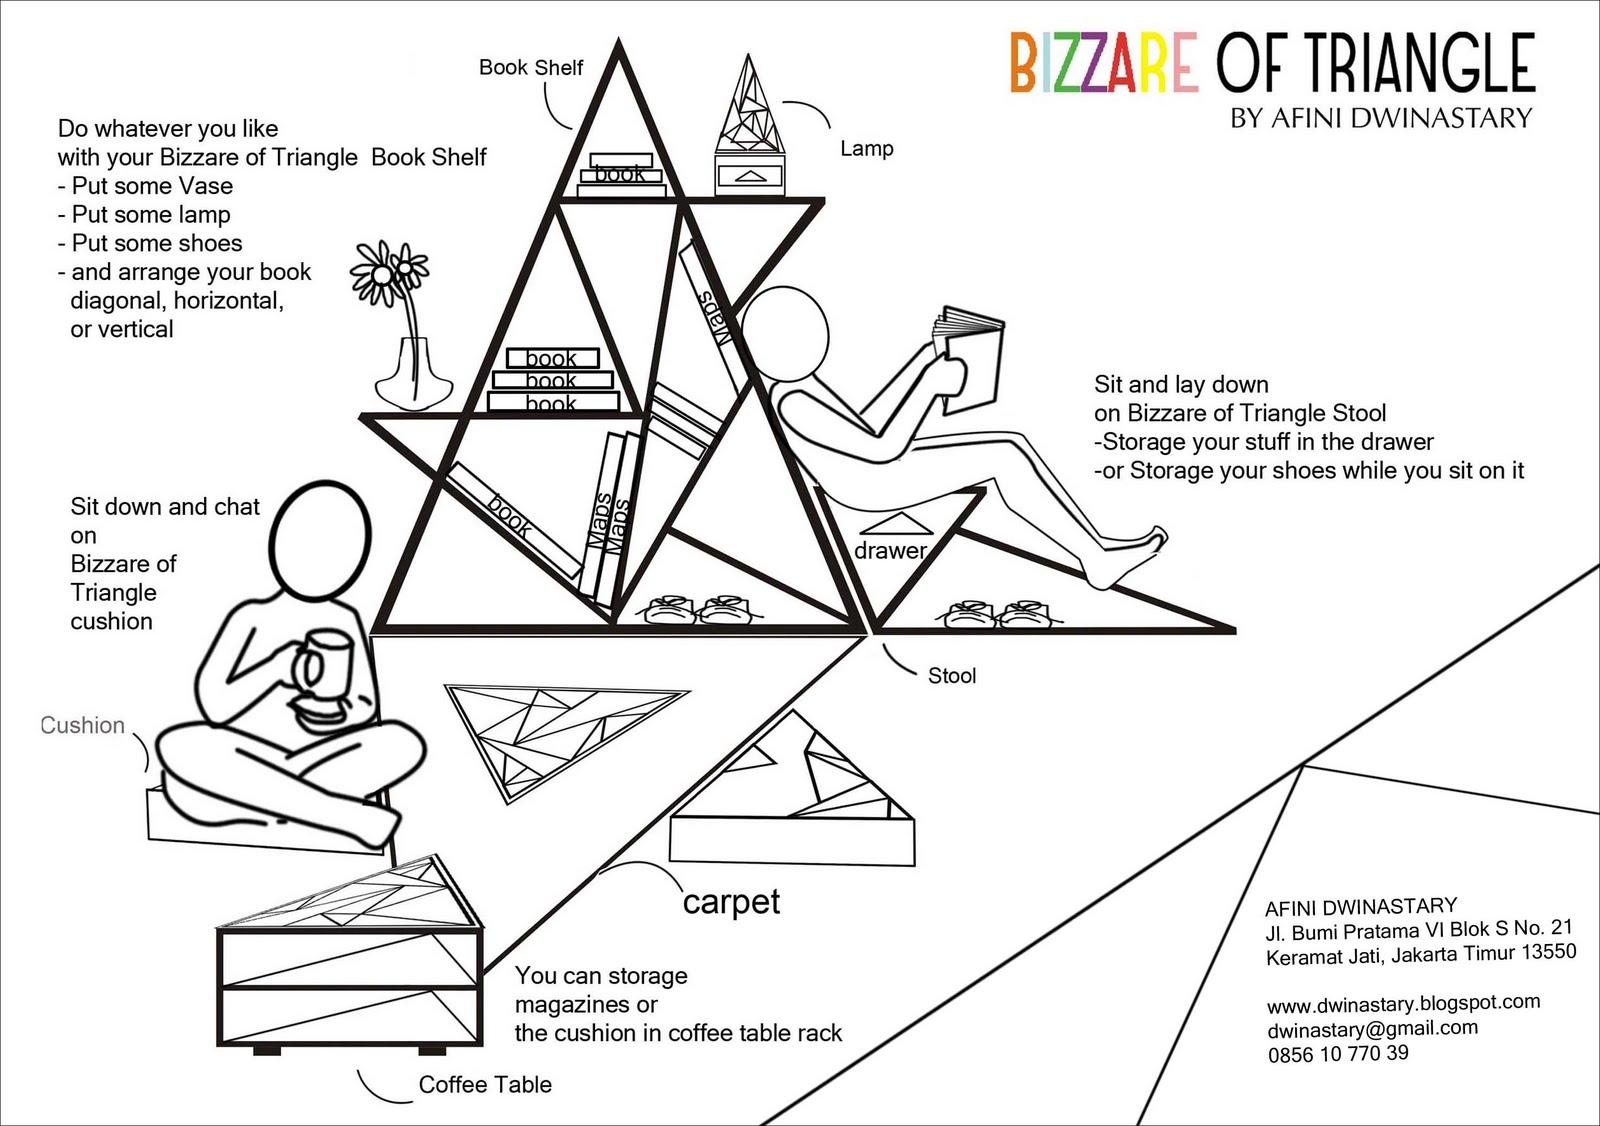 teeth.garden.party: Bizzare of Triangle